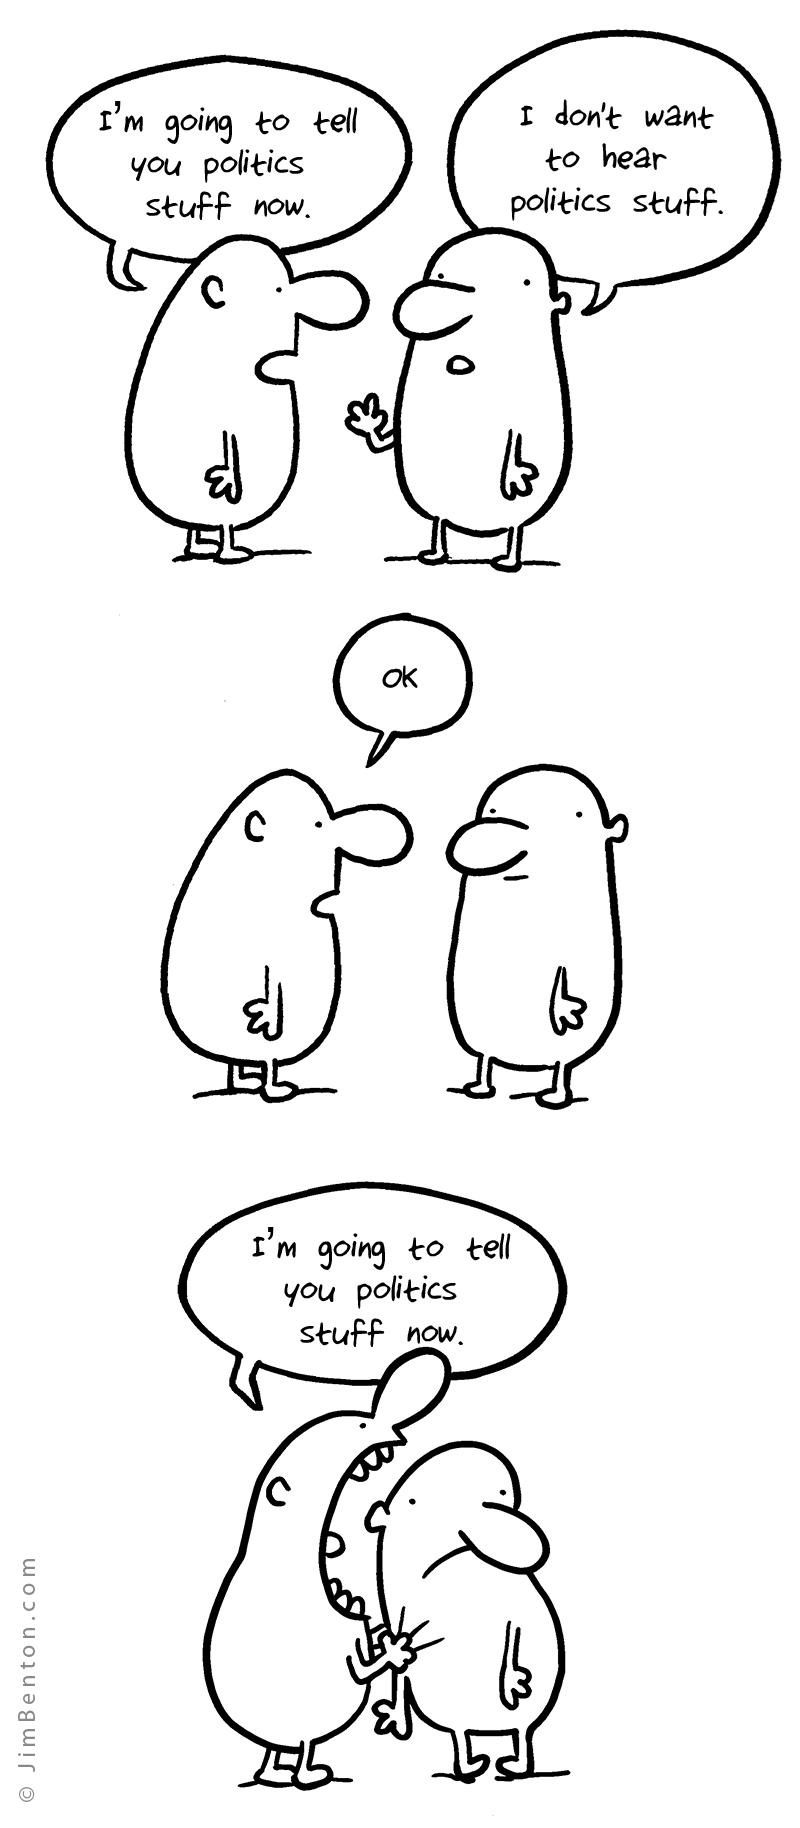 friends-talk-politics-web-comics-trolling-peaceful-conversation